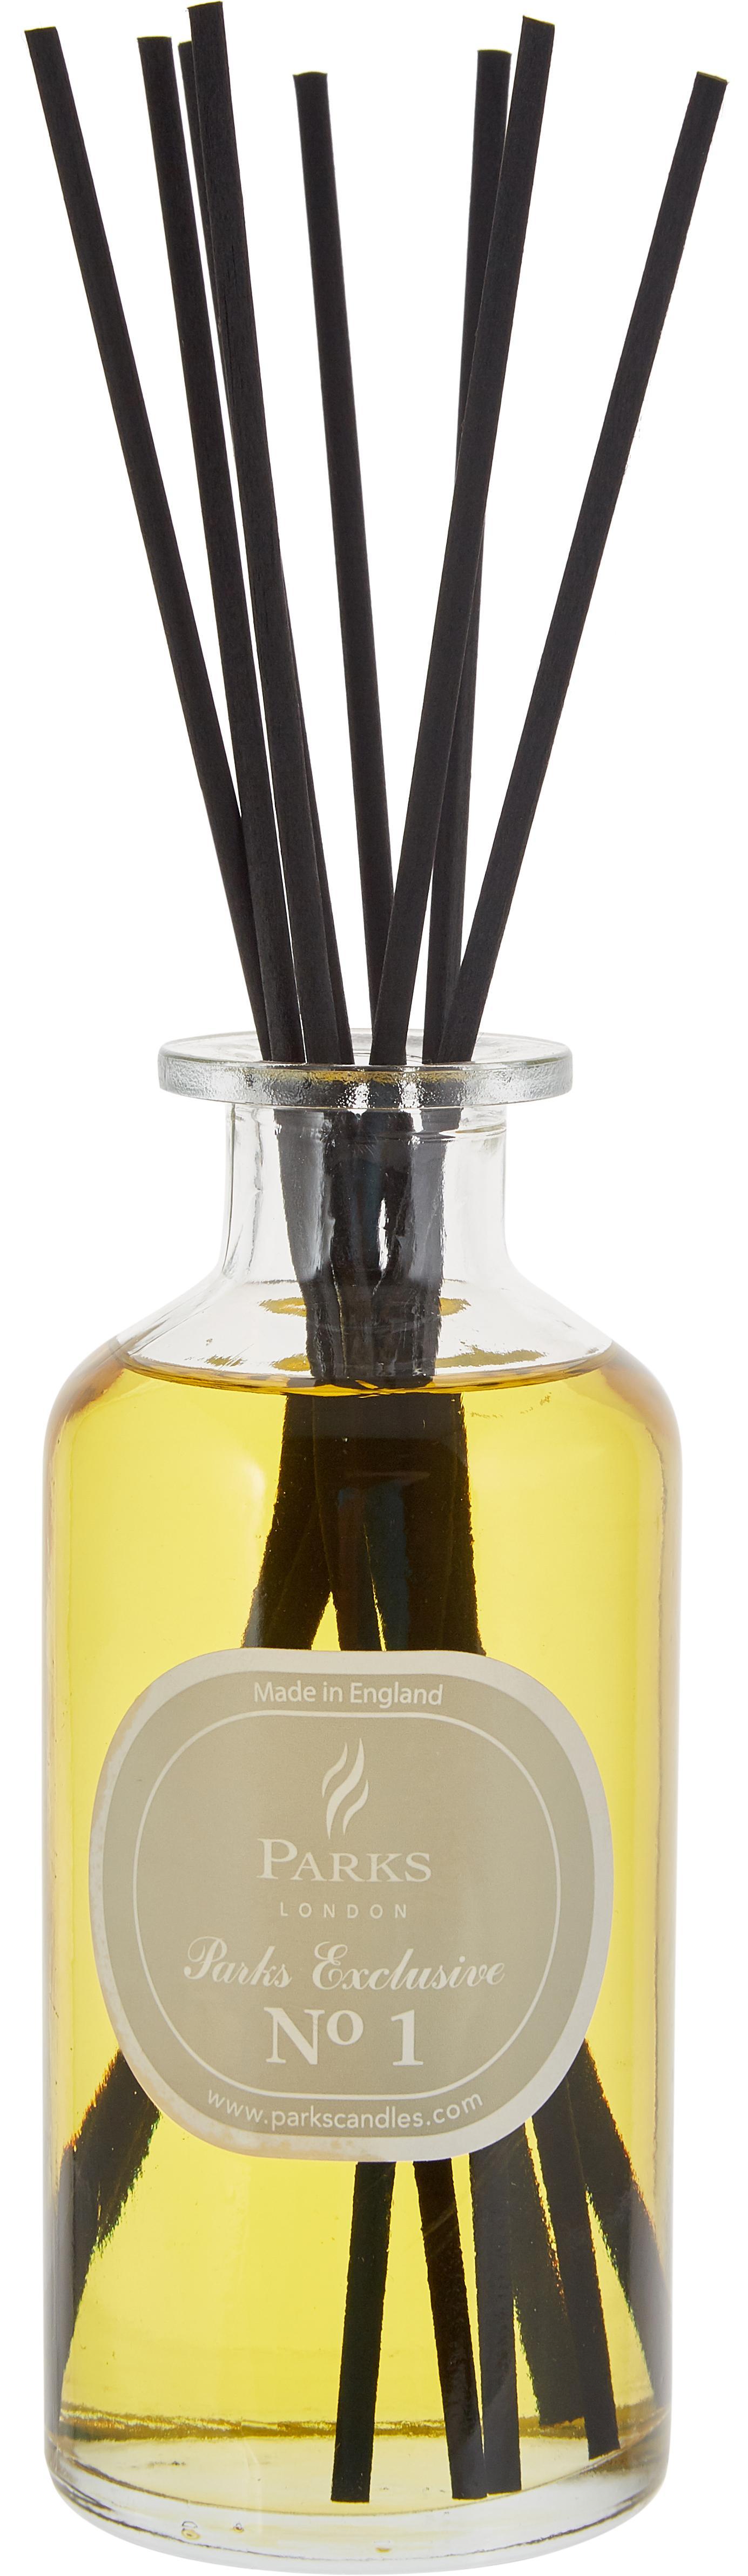 Diffuser Parks Exclusive No.1 (sandelhout & vanille), Transparant, lichtbruin, grijs, 250 ml